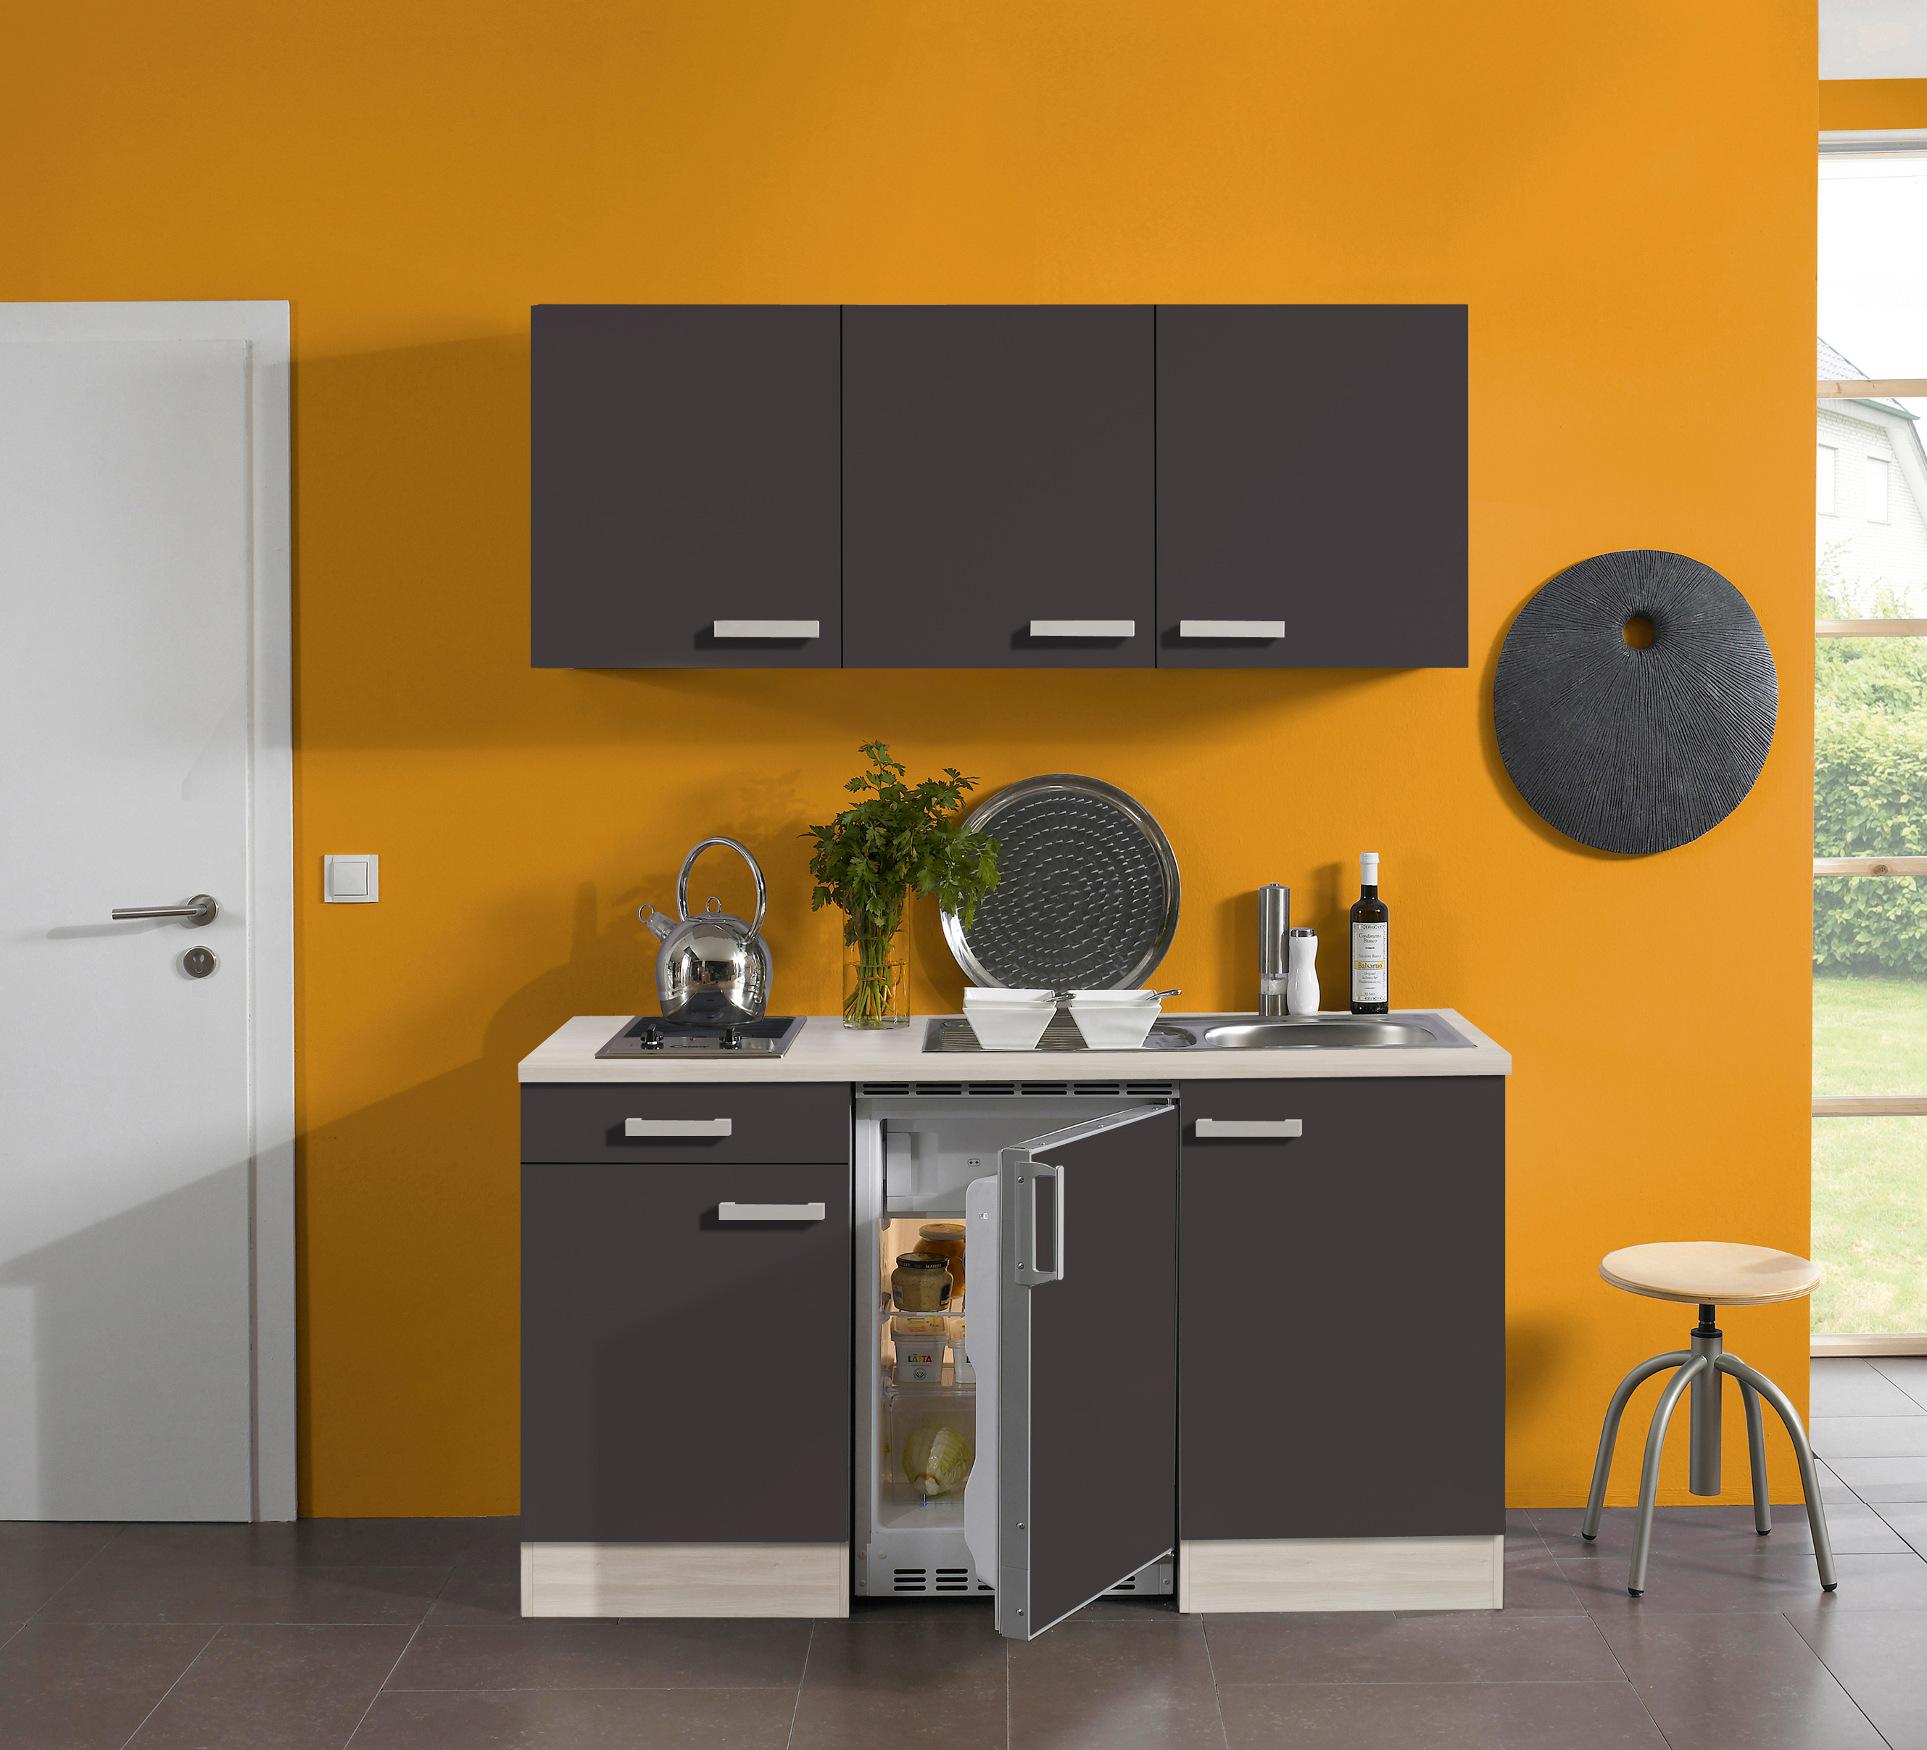 singlek che barcelona glaskeramik kochfeld 8 teilig breite 150 cm grau k che singlek chen. Black Bedroom Furniture Sets. Home Design Ideas